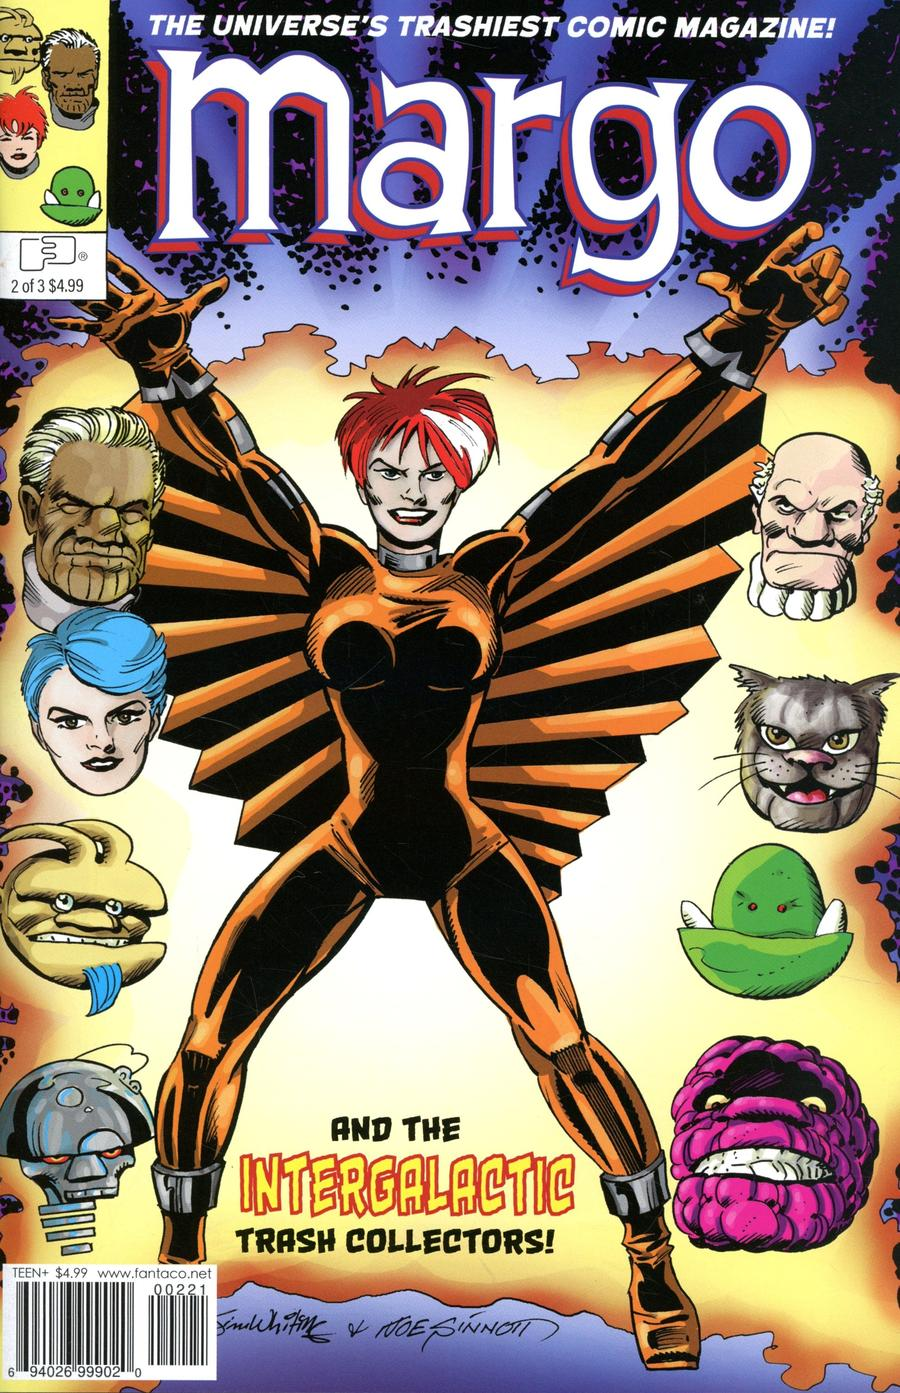 Margo Intergalactic Trash Collector #2 Cover B Variant Joe Sinnott Cover